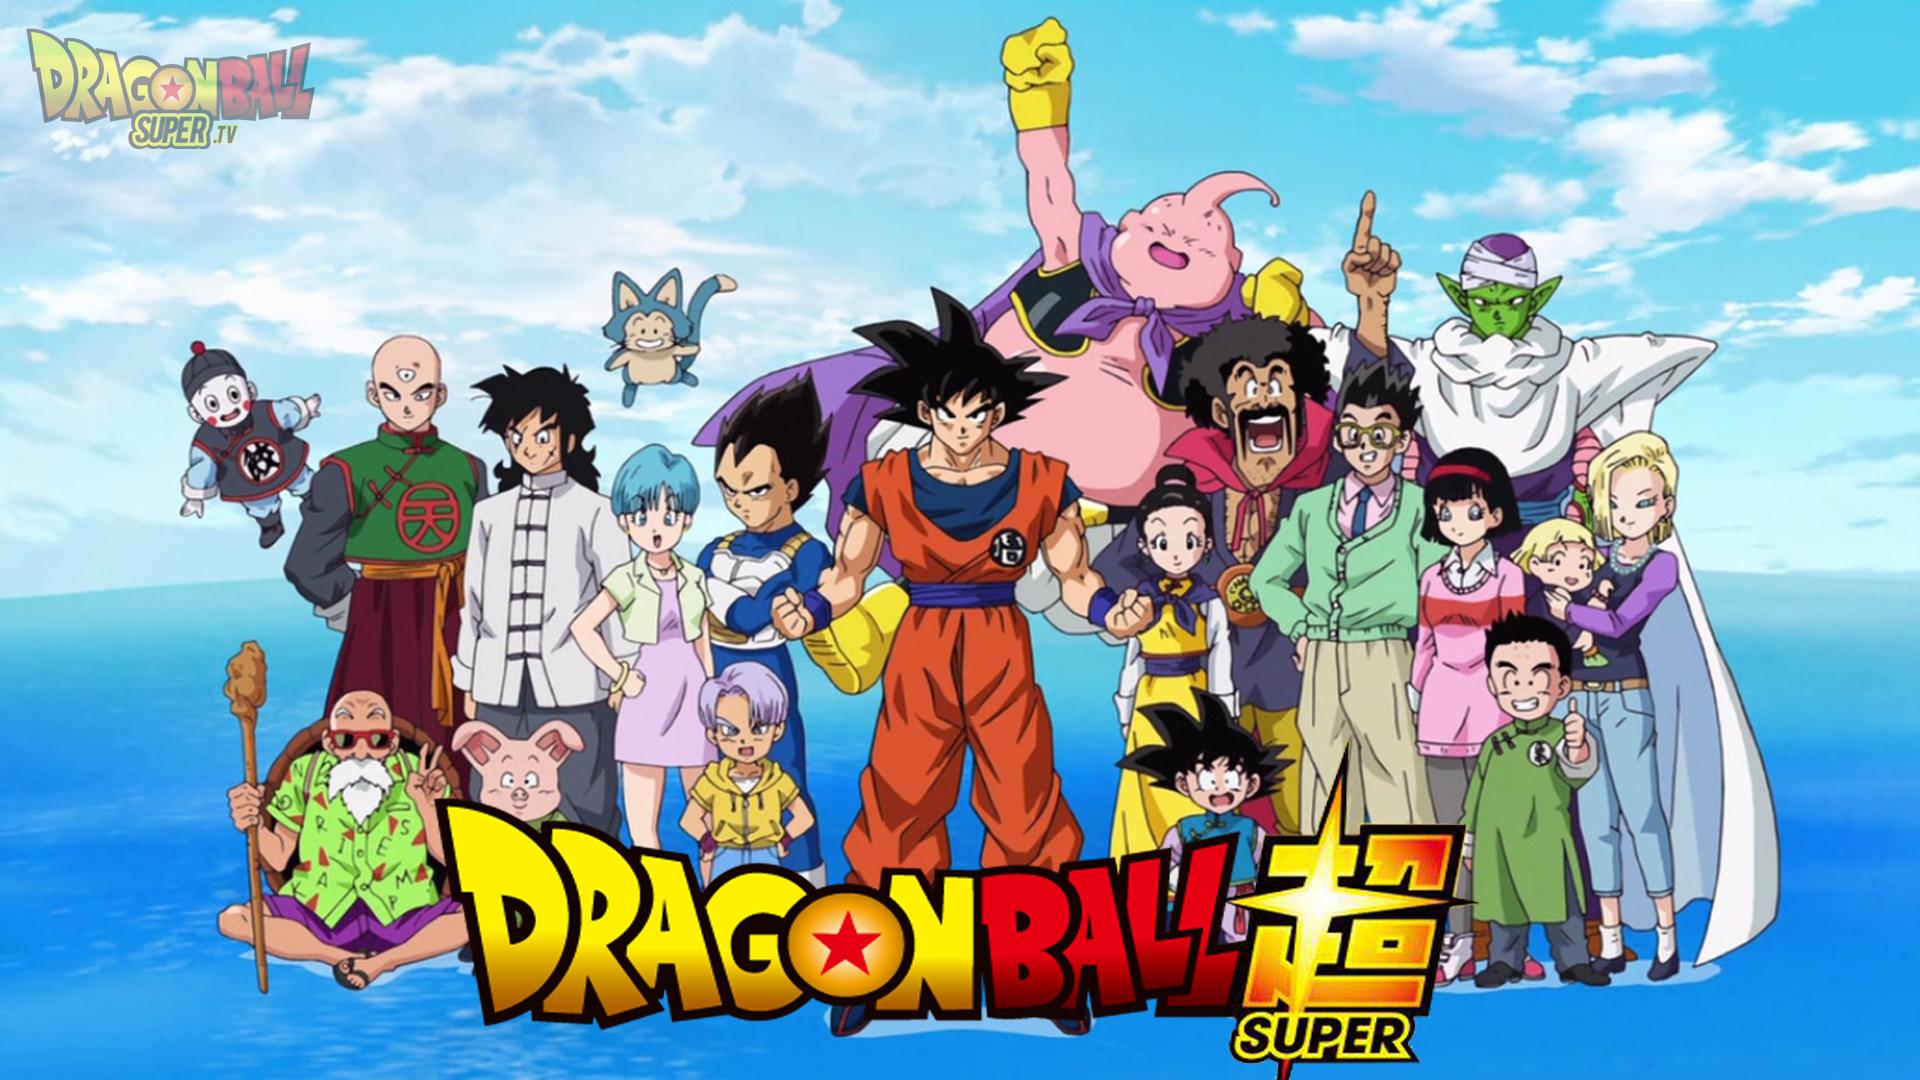 Dragon Ball Super Wallpaper HD Picture tag Dragonball Super 1920x1080